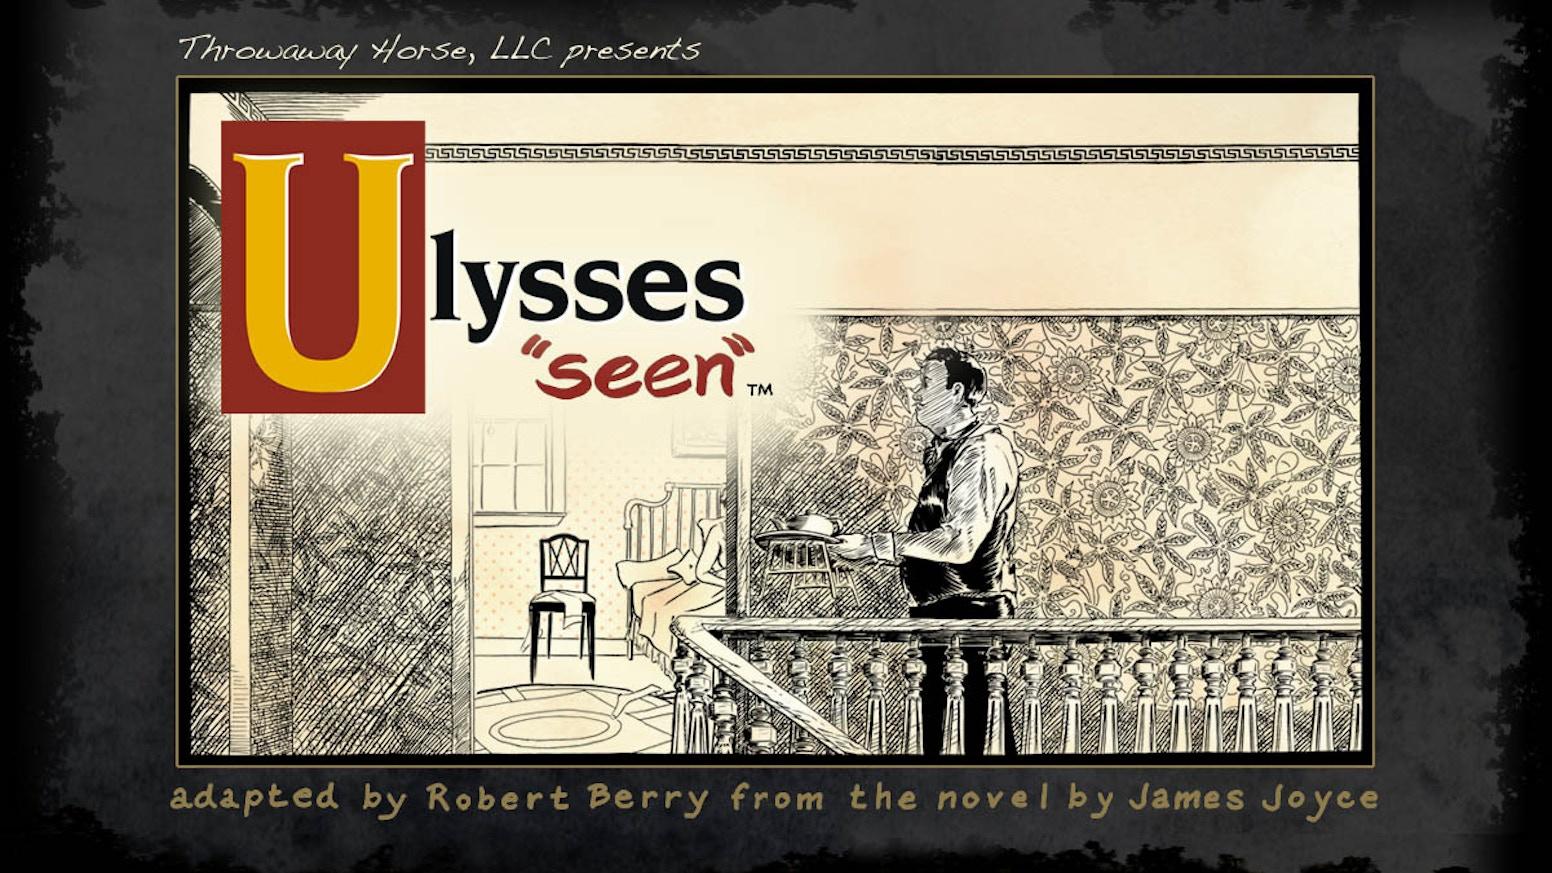 A Comic Of James Joyces Ulysses By Throwaway Horse